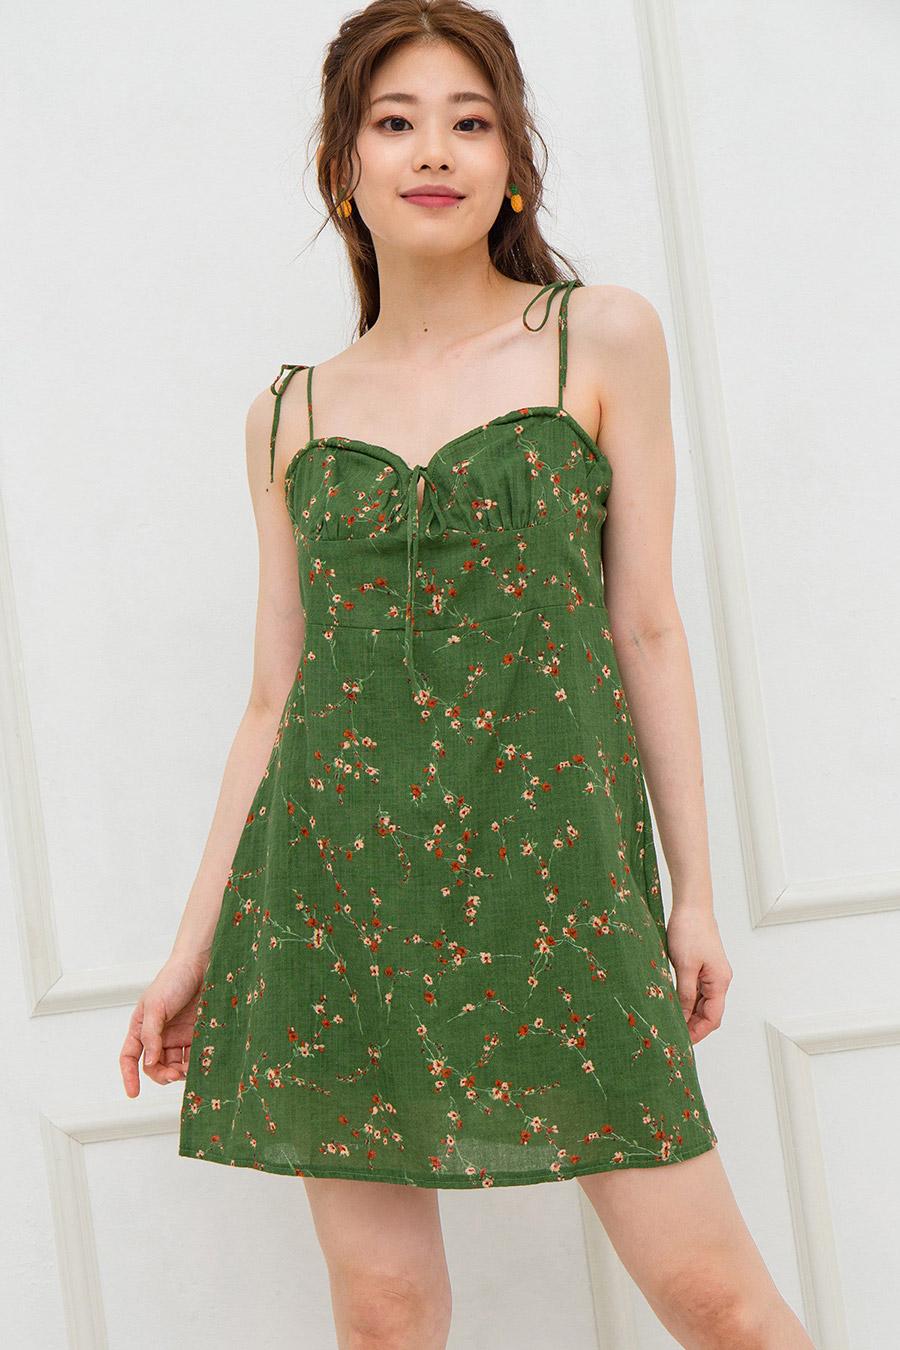 LAURINE DRESS - FOREST FLEUR